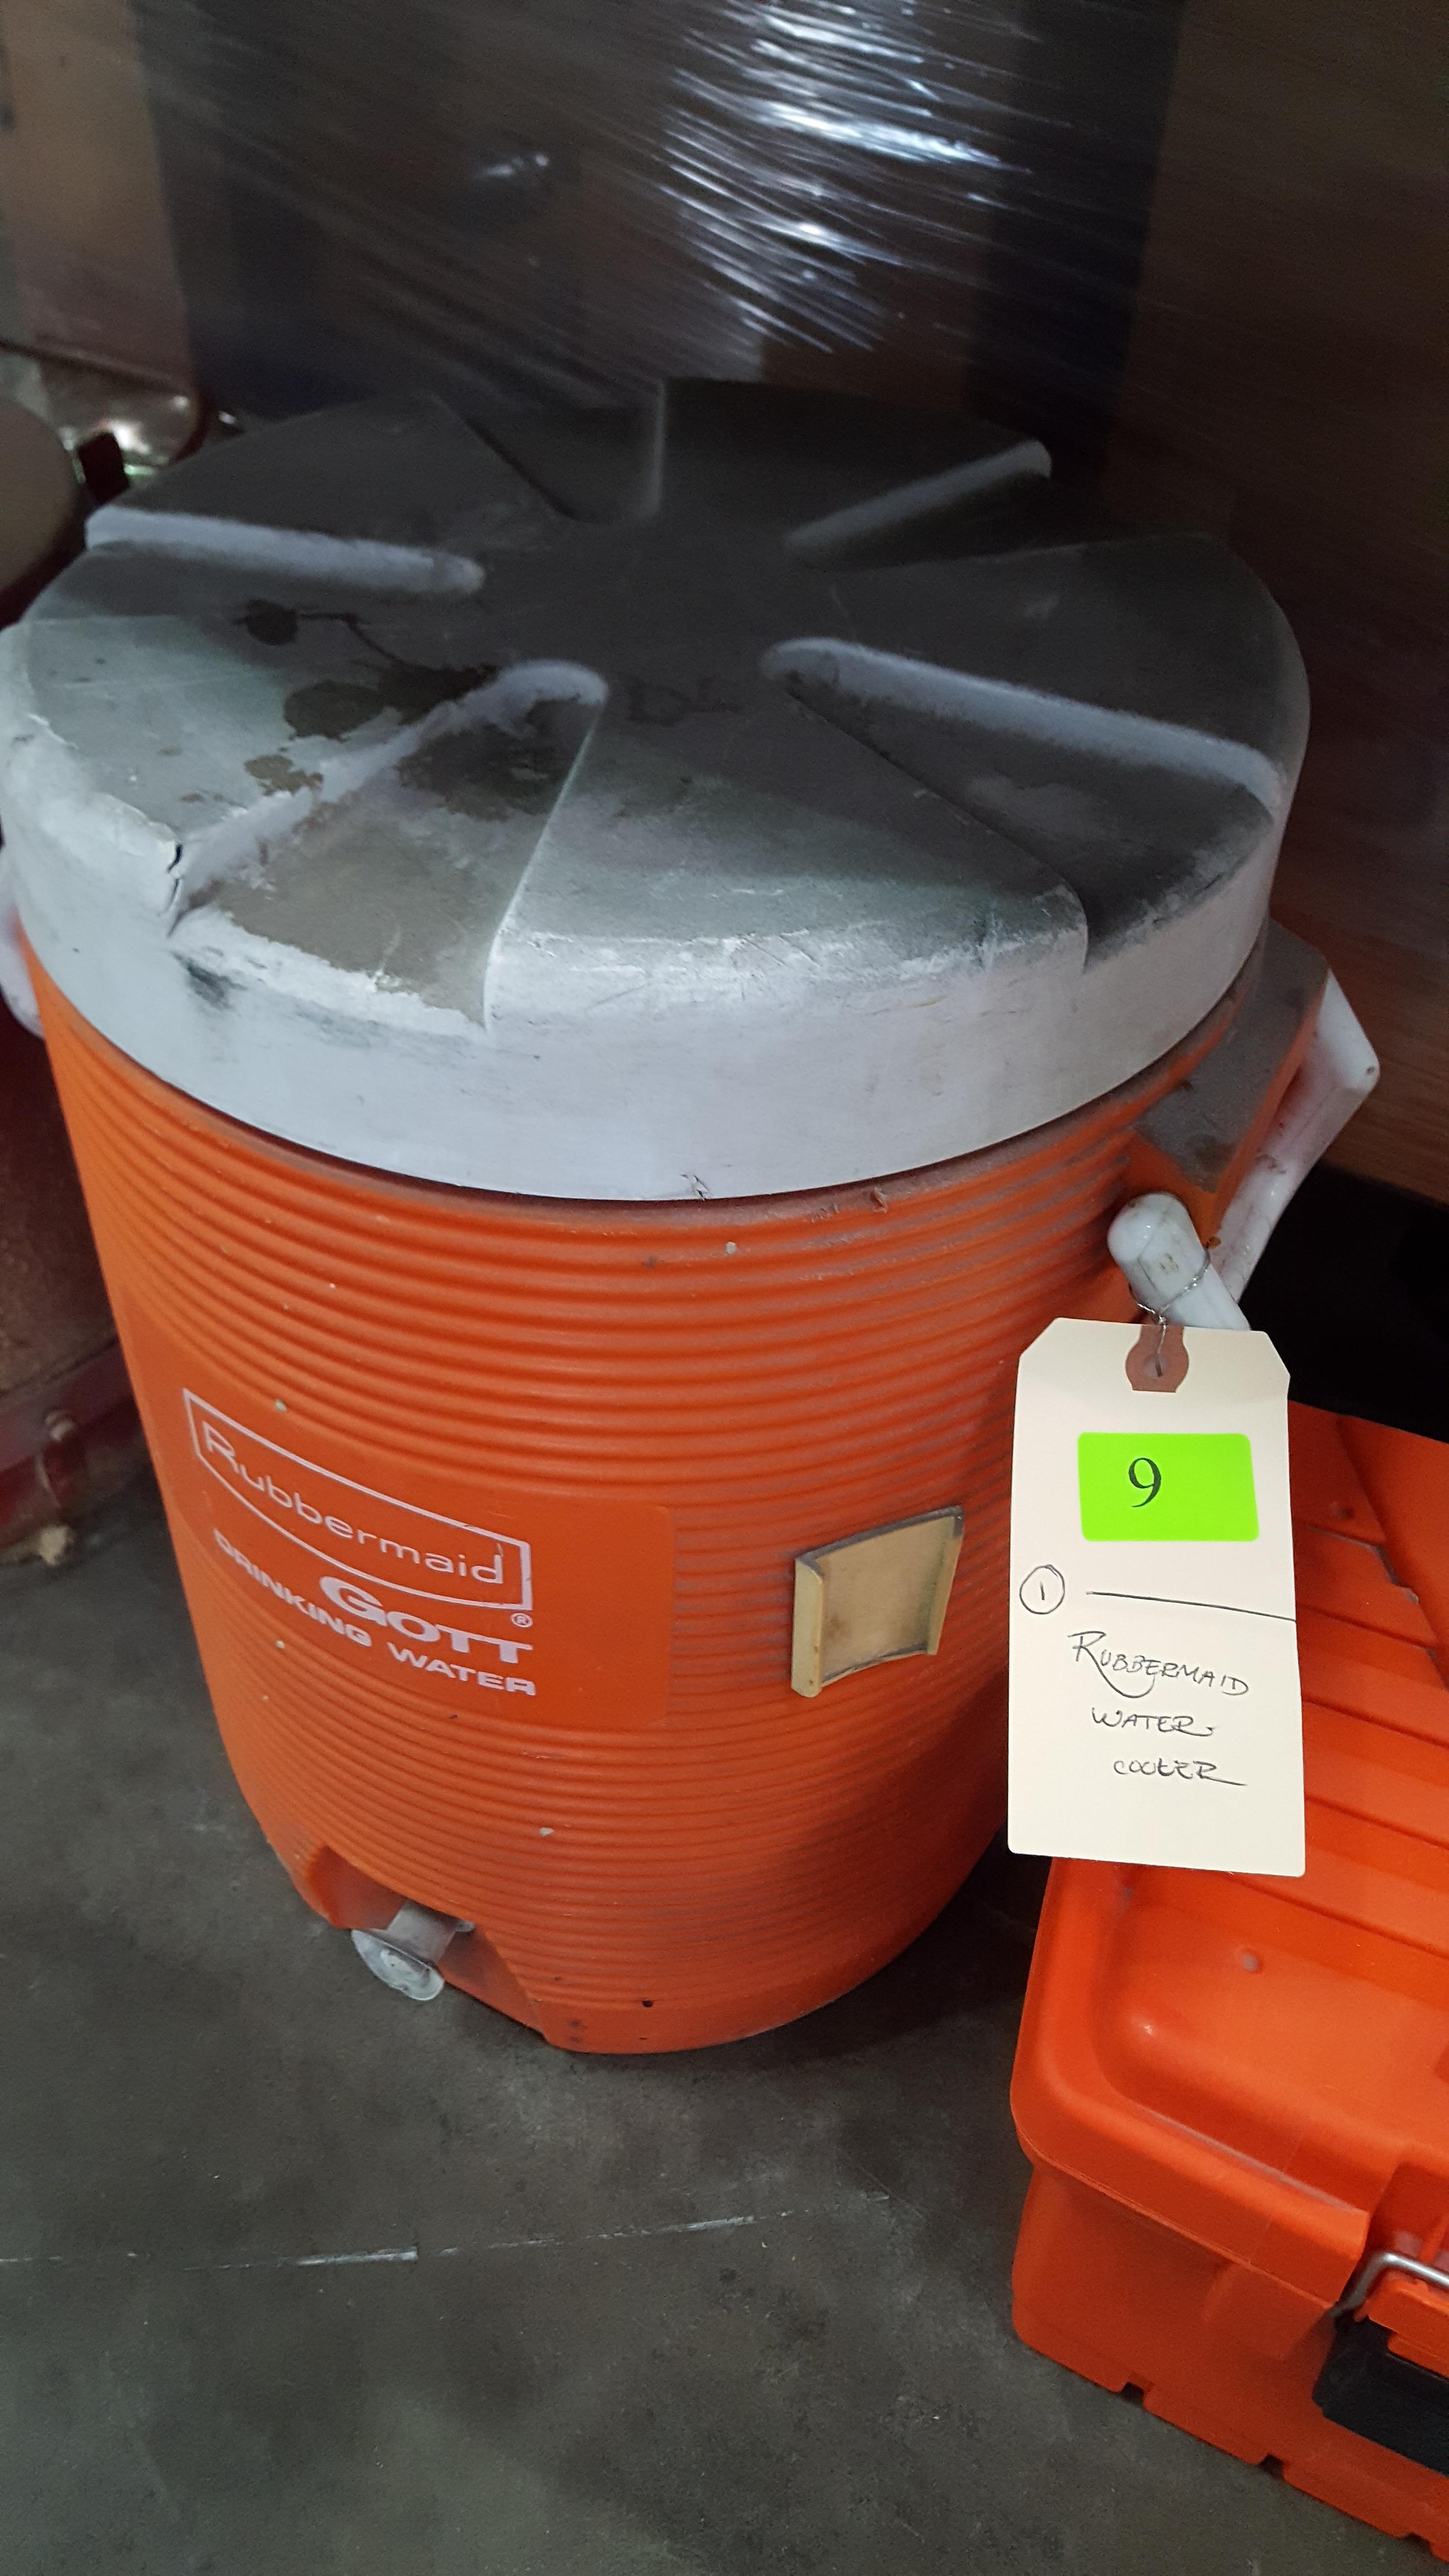 RUBBERMAID WATER COOLER